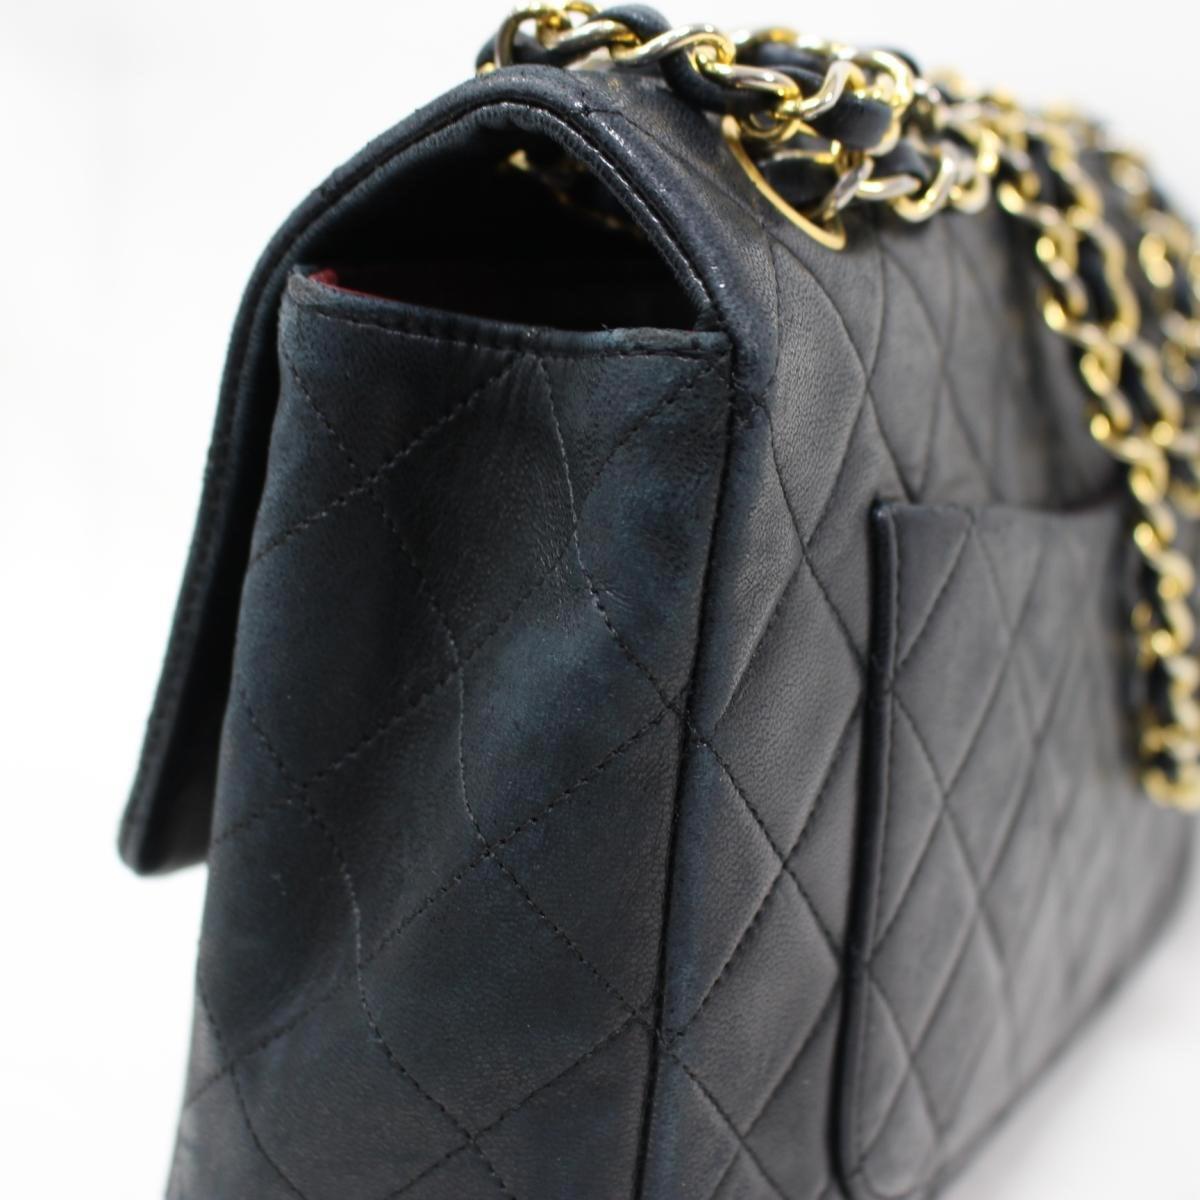 d5bc68ec61401 Lyst - Chanel Matelasse Chain Shoulder Bag Lamb Skin Leather Black ...